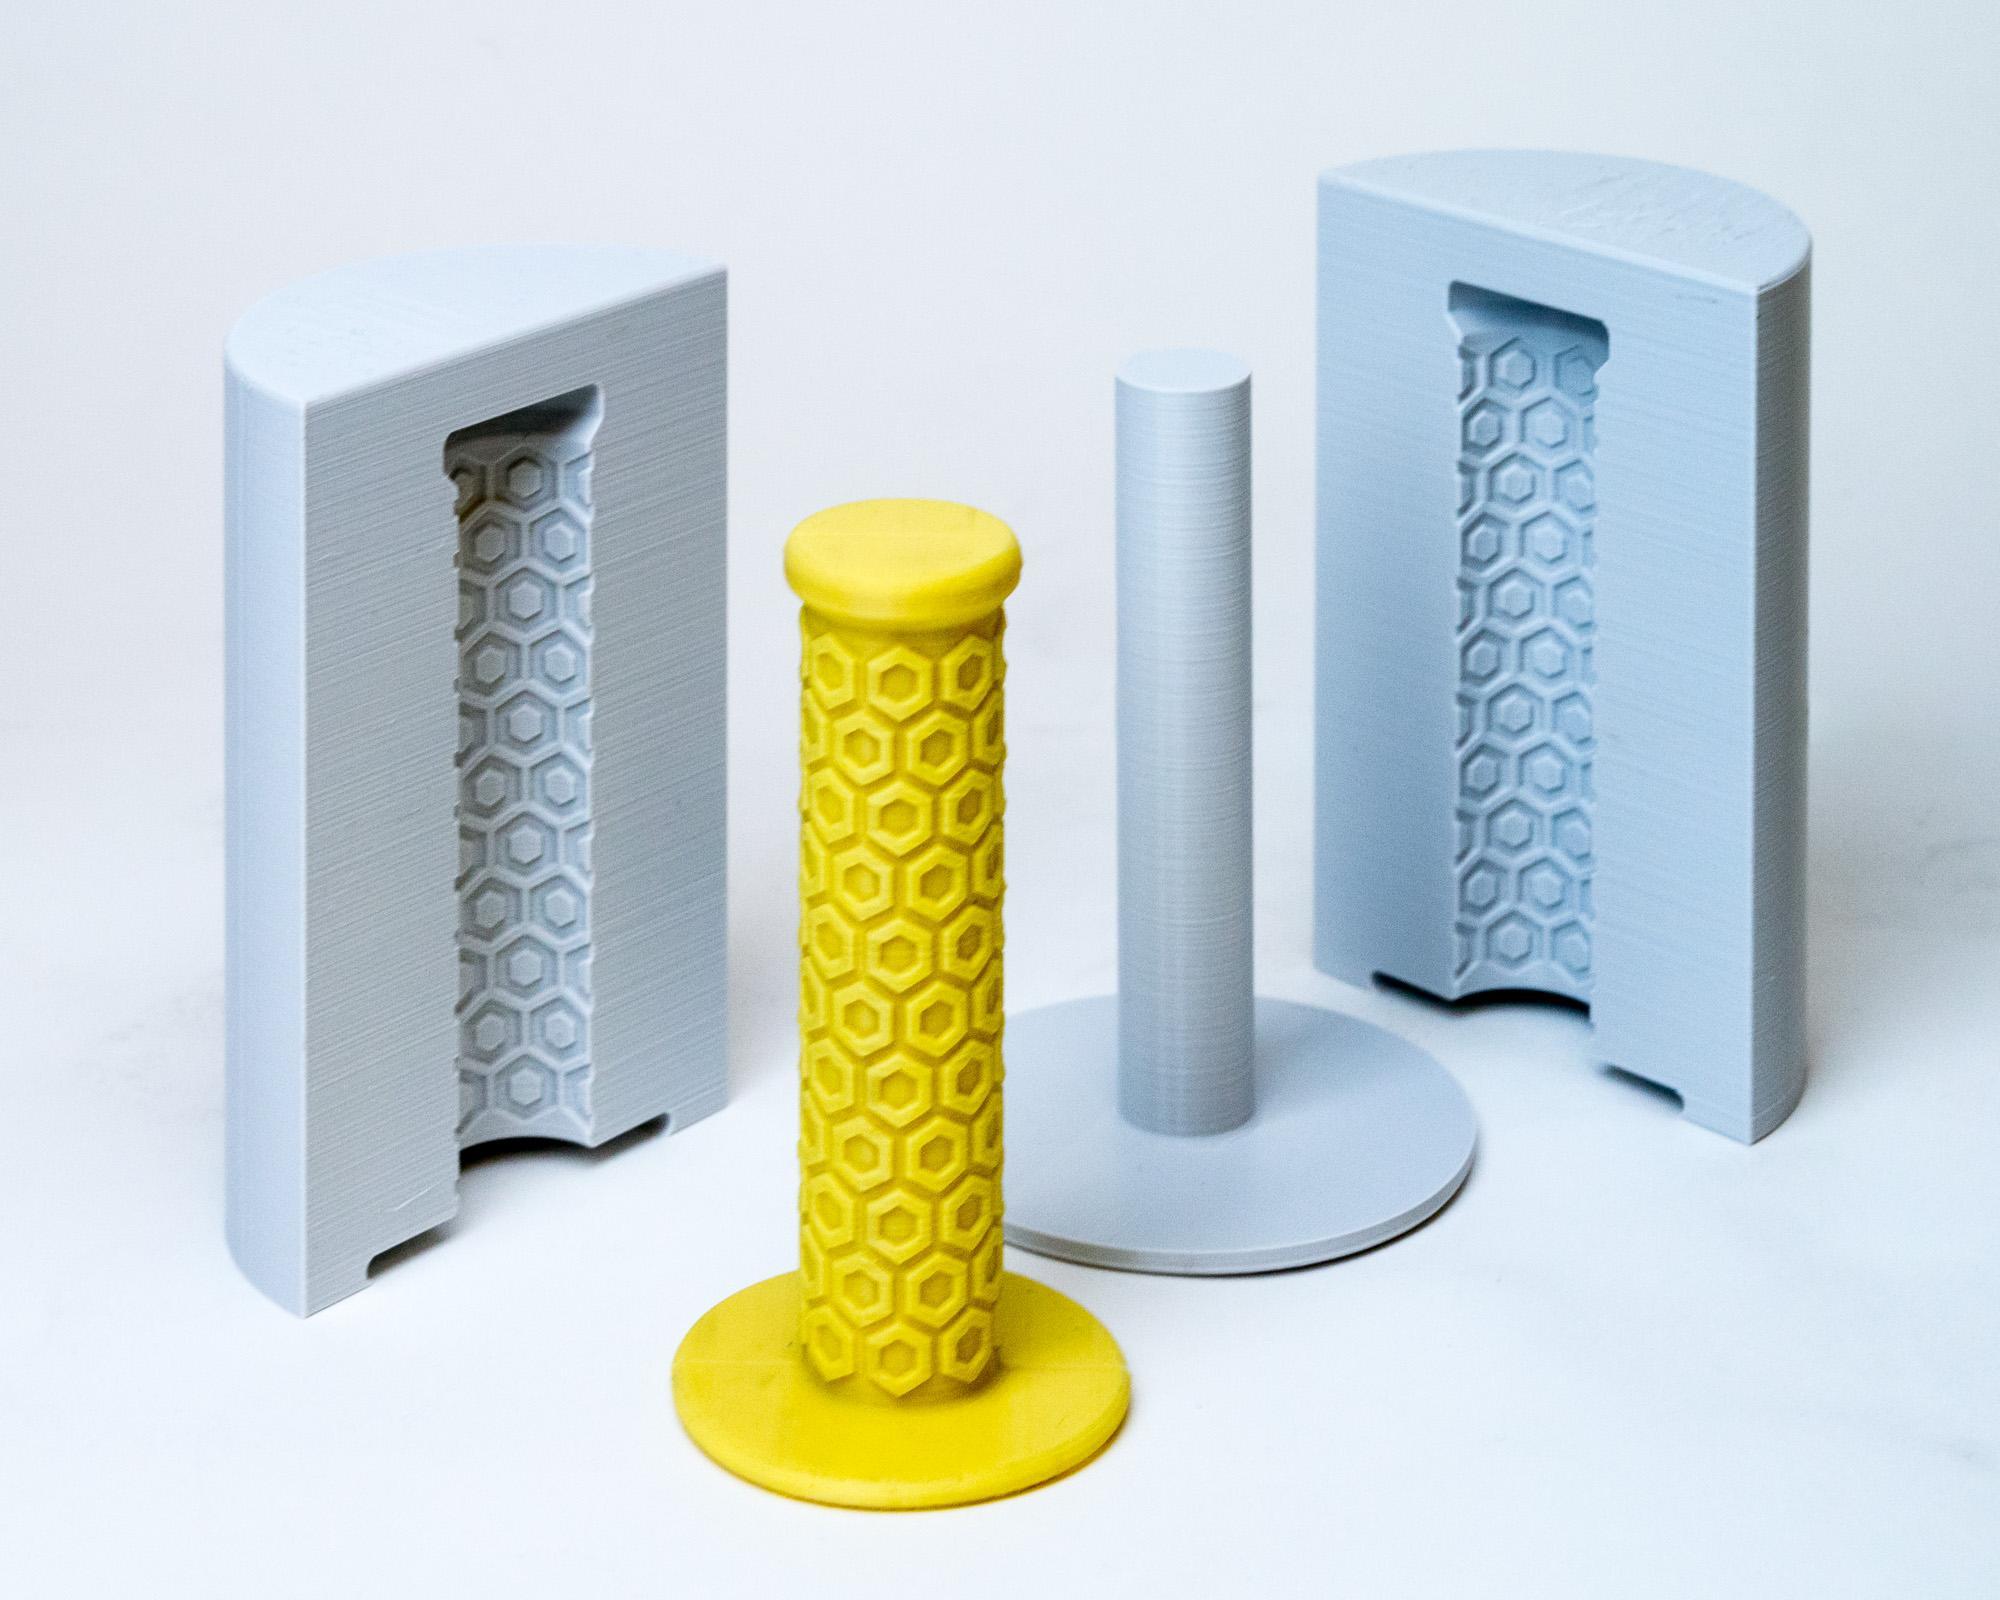 Bike handlegrip from 3D printed mold